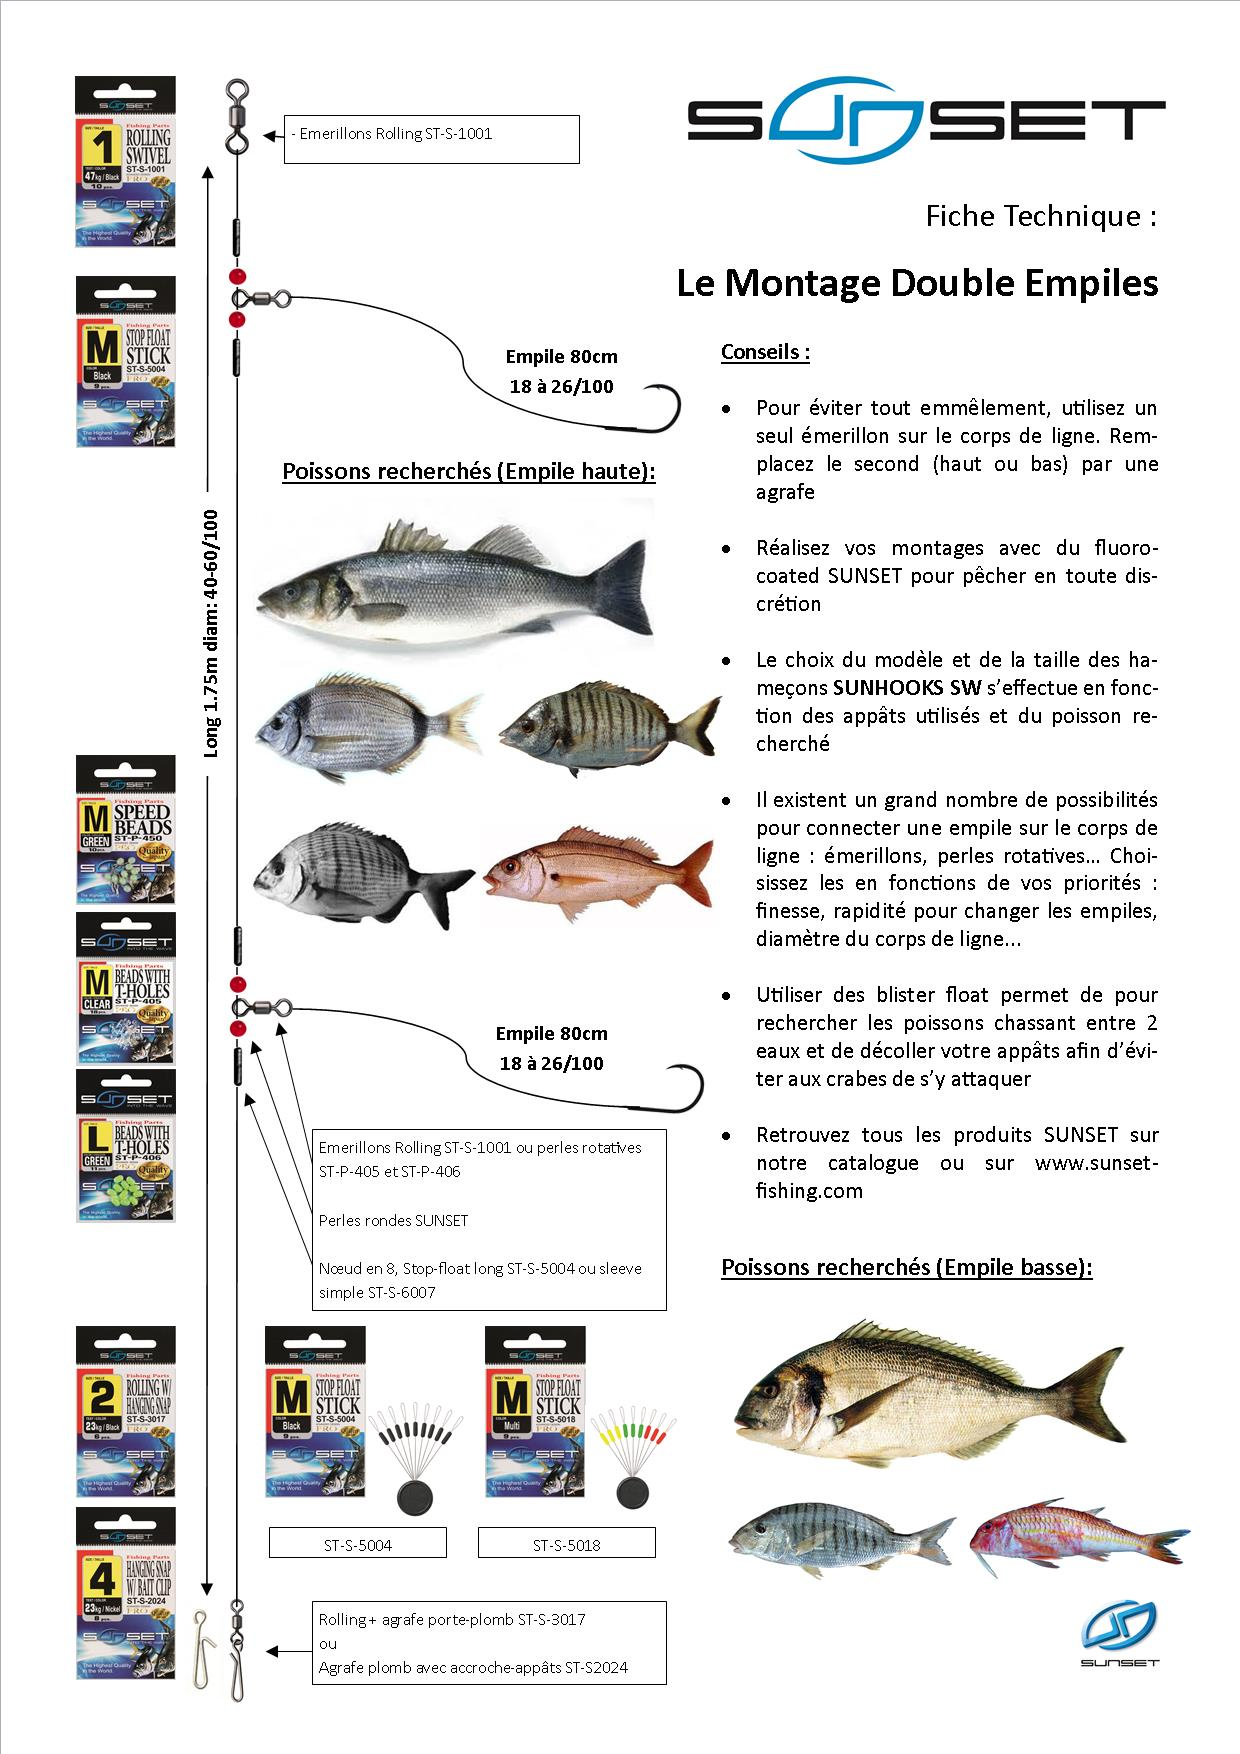 1-LE MONTAGE DOUBLE EMPILES.jpg